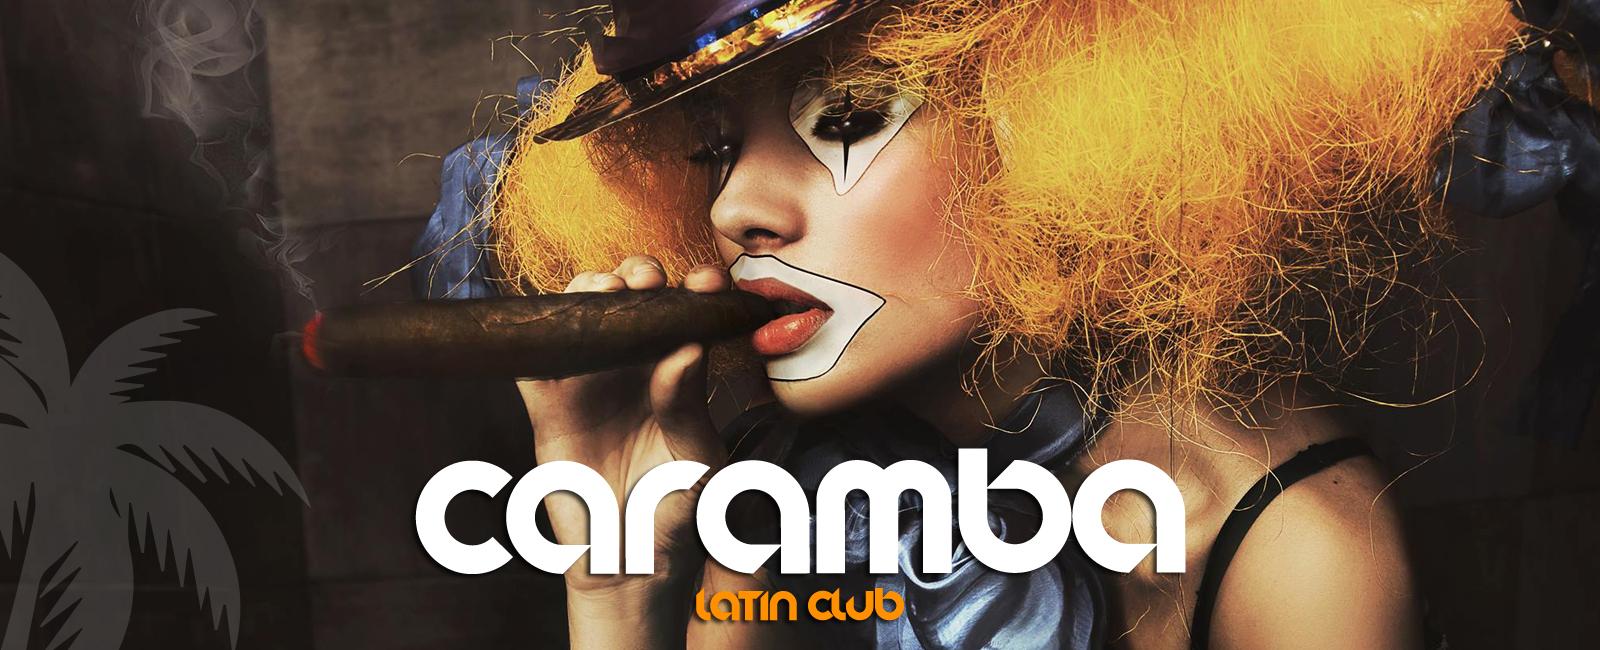 Caramba latin club in North Finchley